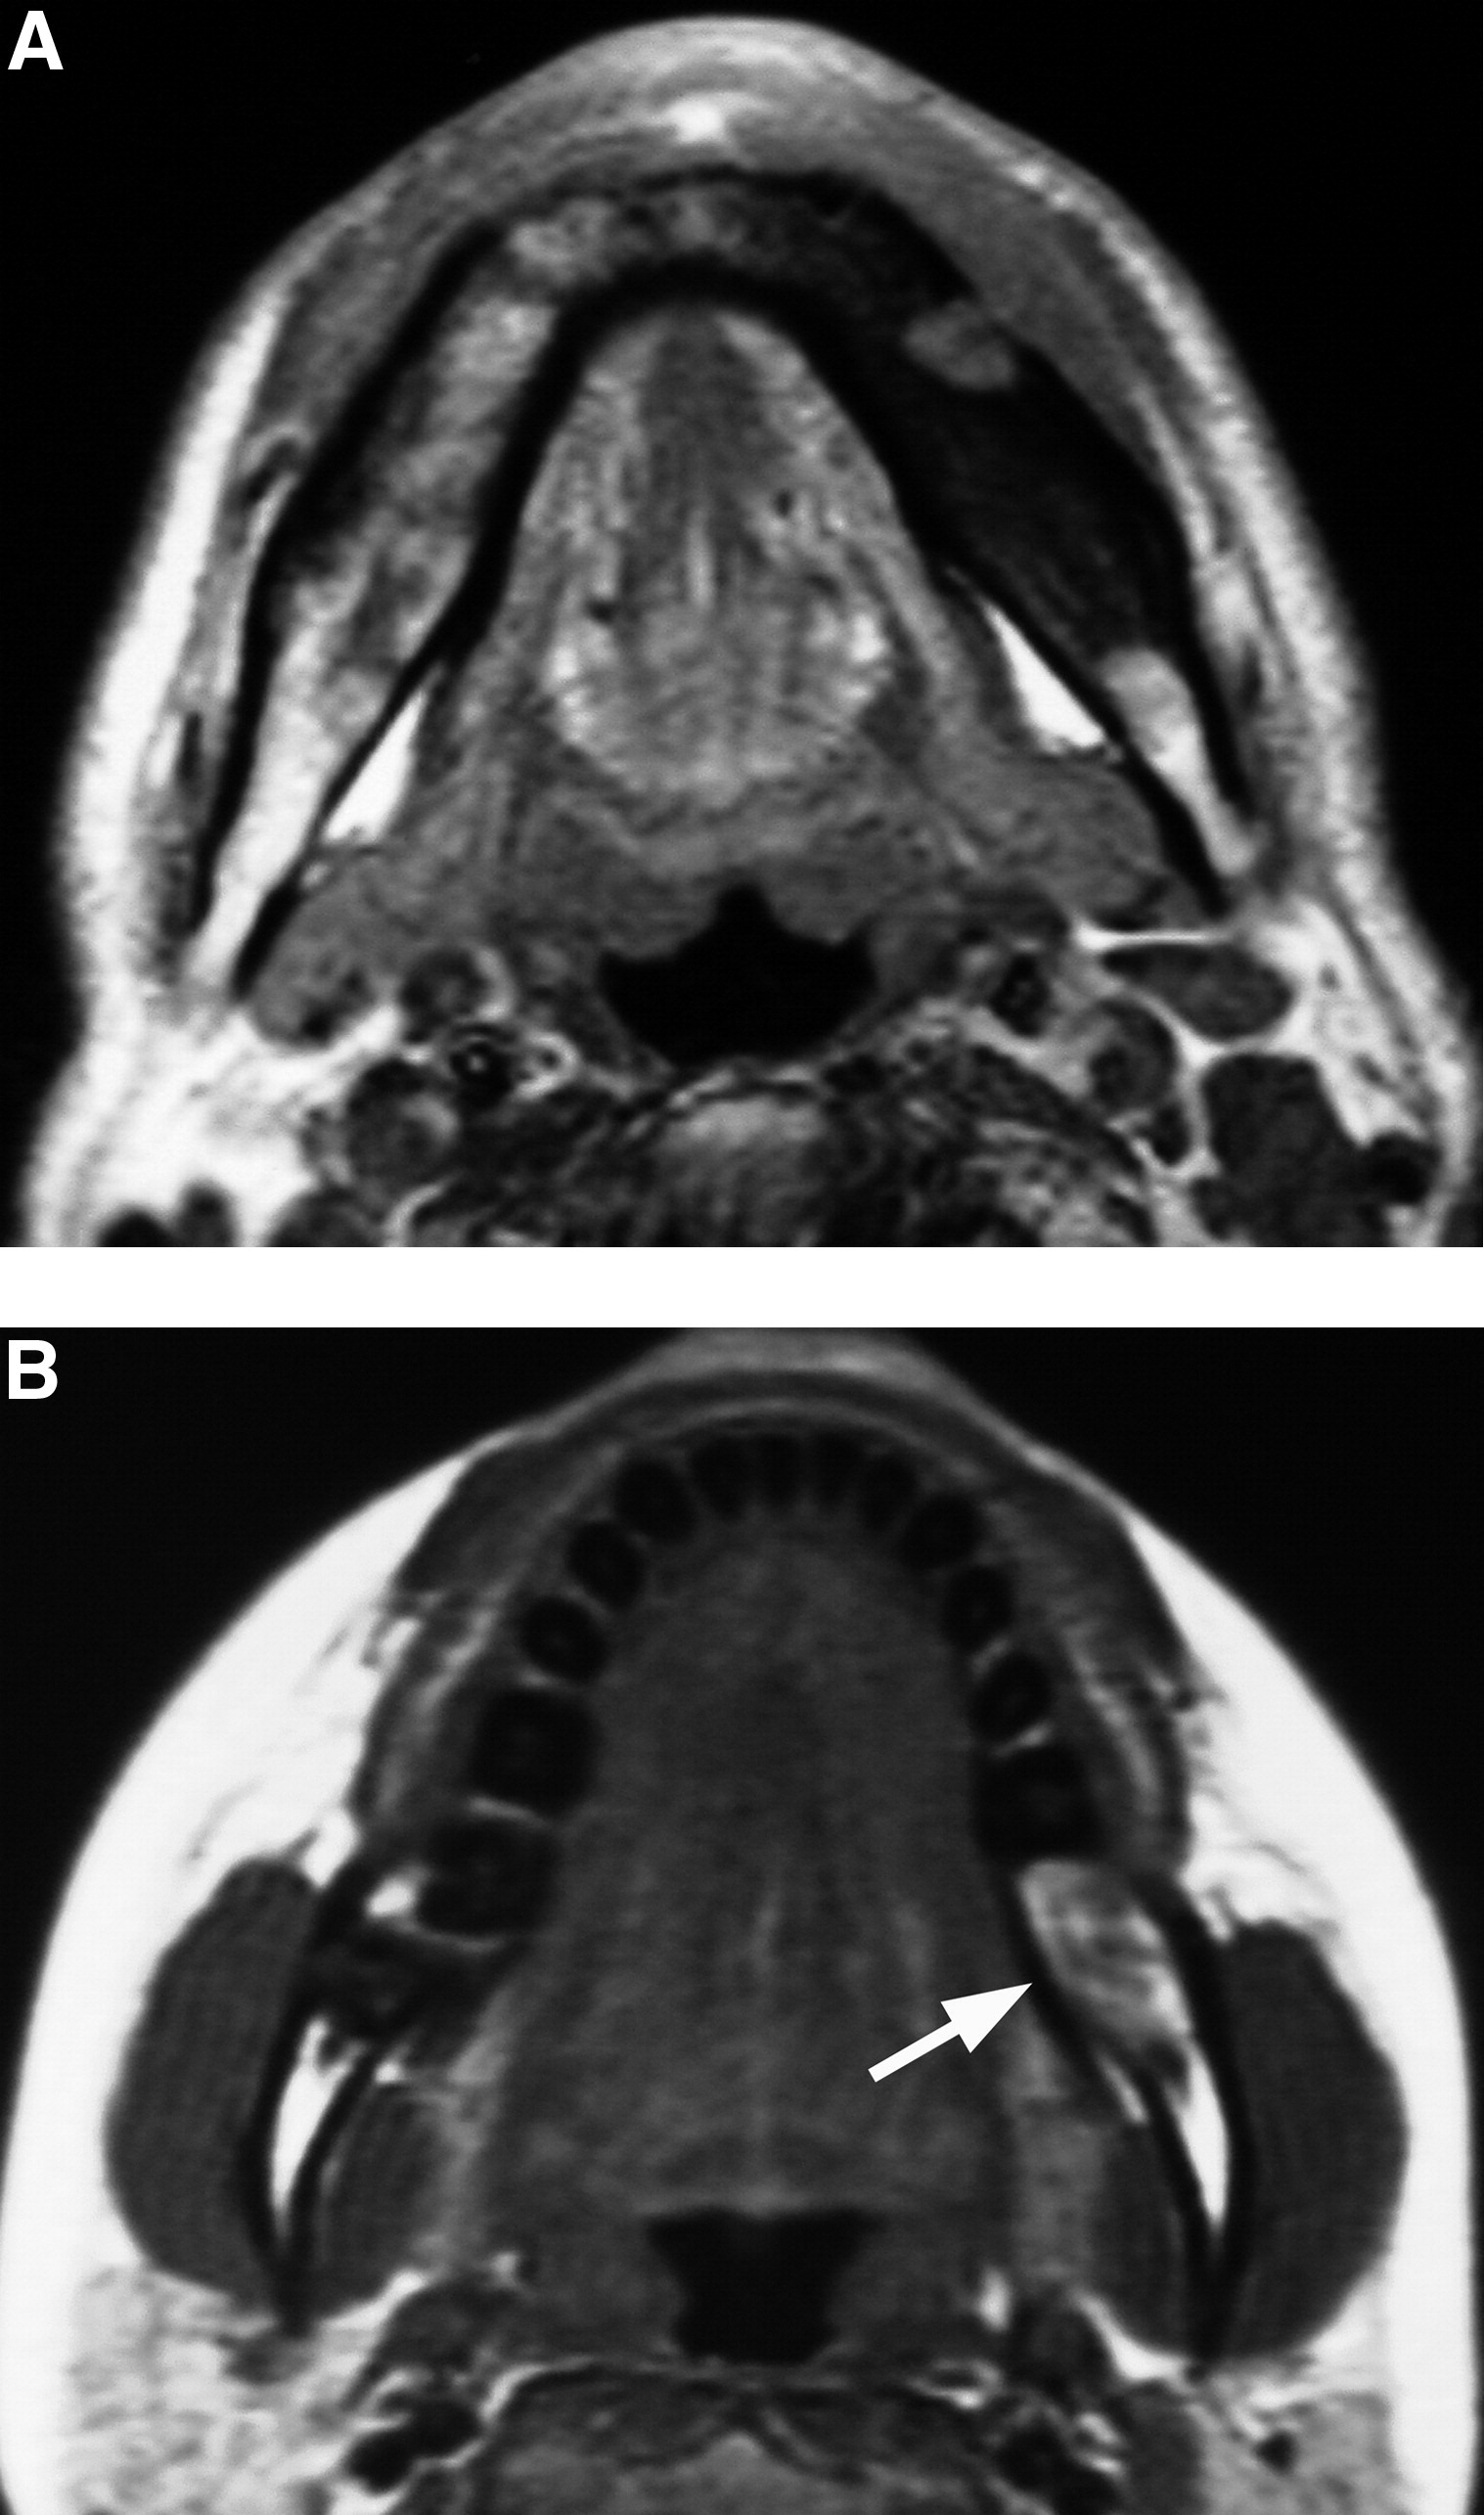 Mri Features Of Mandibular Osteomyelitis Practical Criteria Based On An Association With